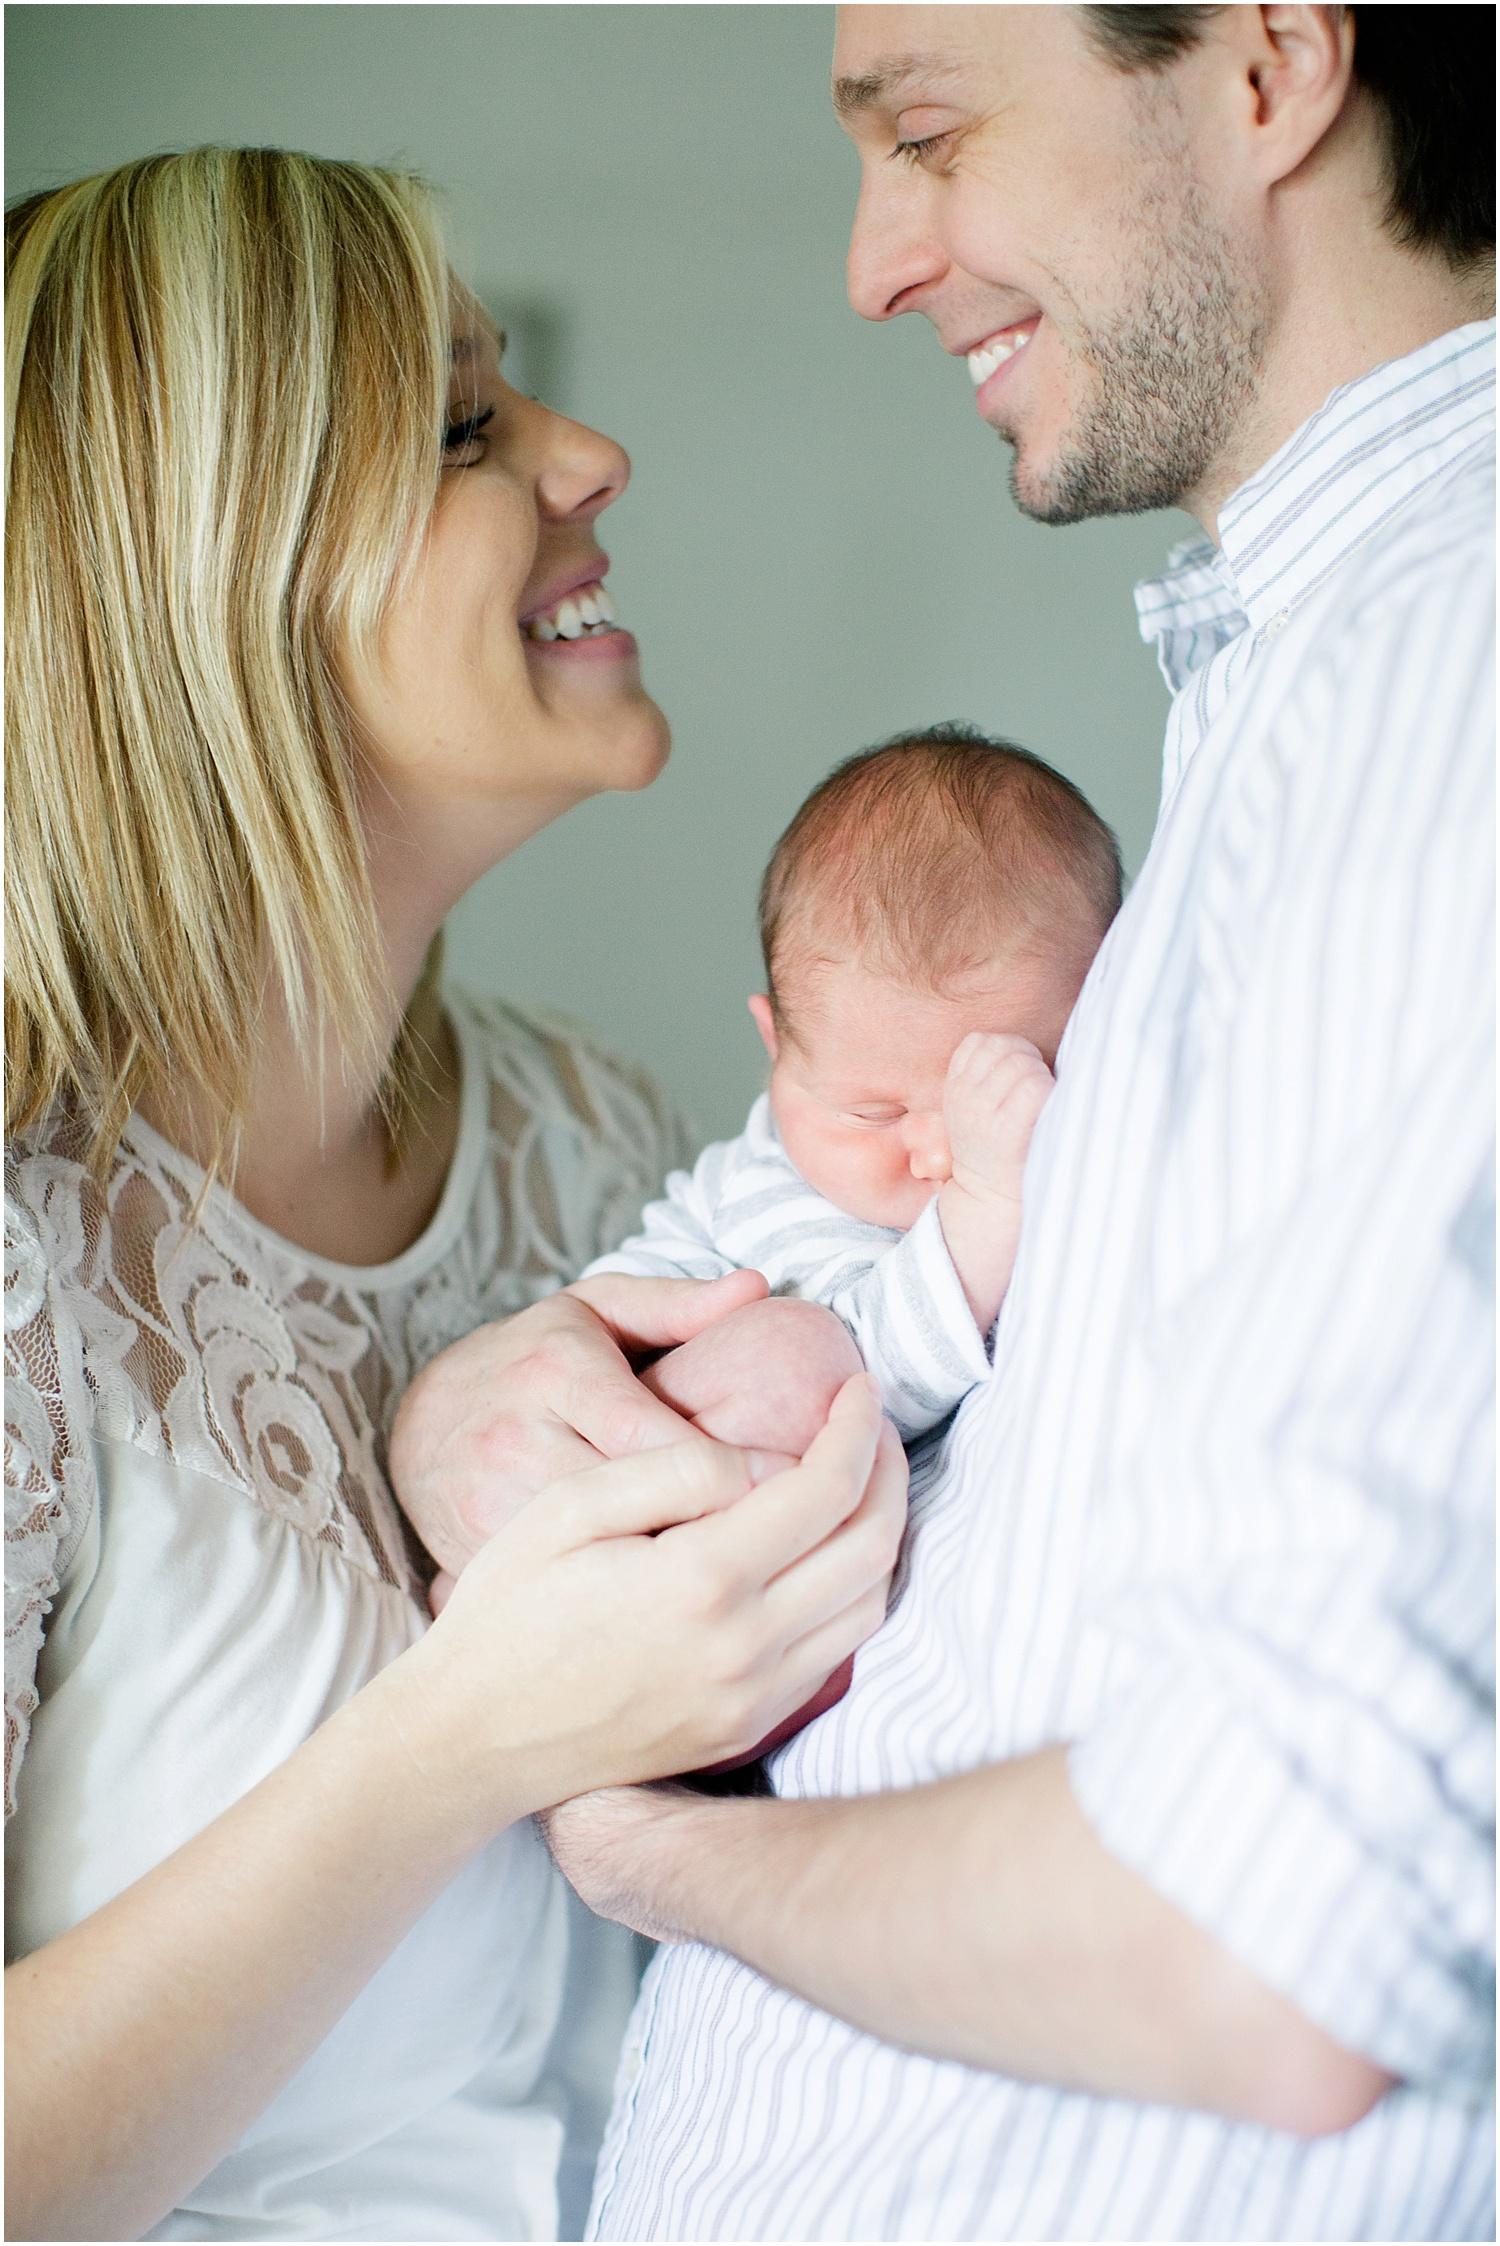 Ashley Powell Photography Grayson Newborn Session_0033.jpg